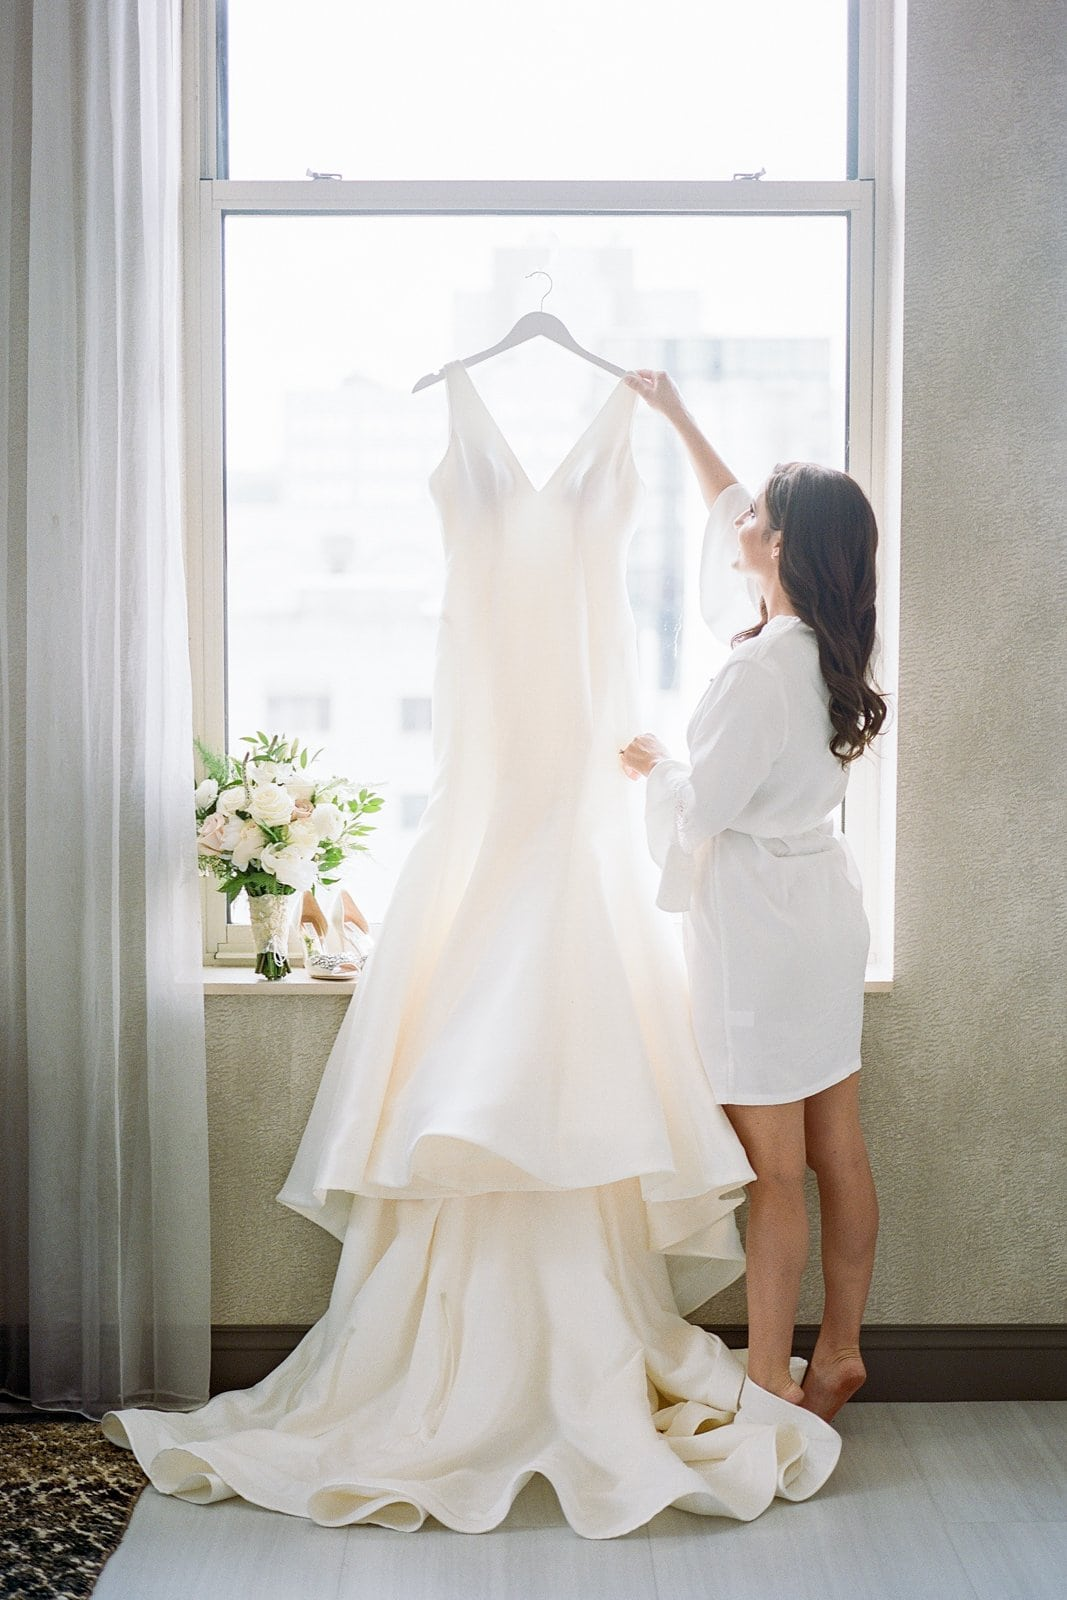 bring taking down her wedding dress to get dressed